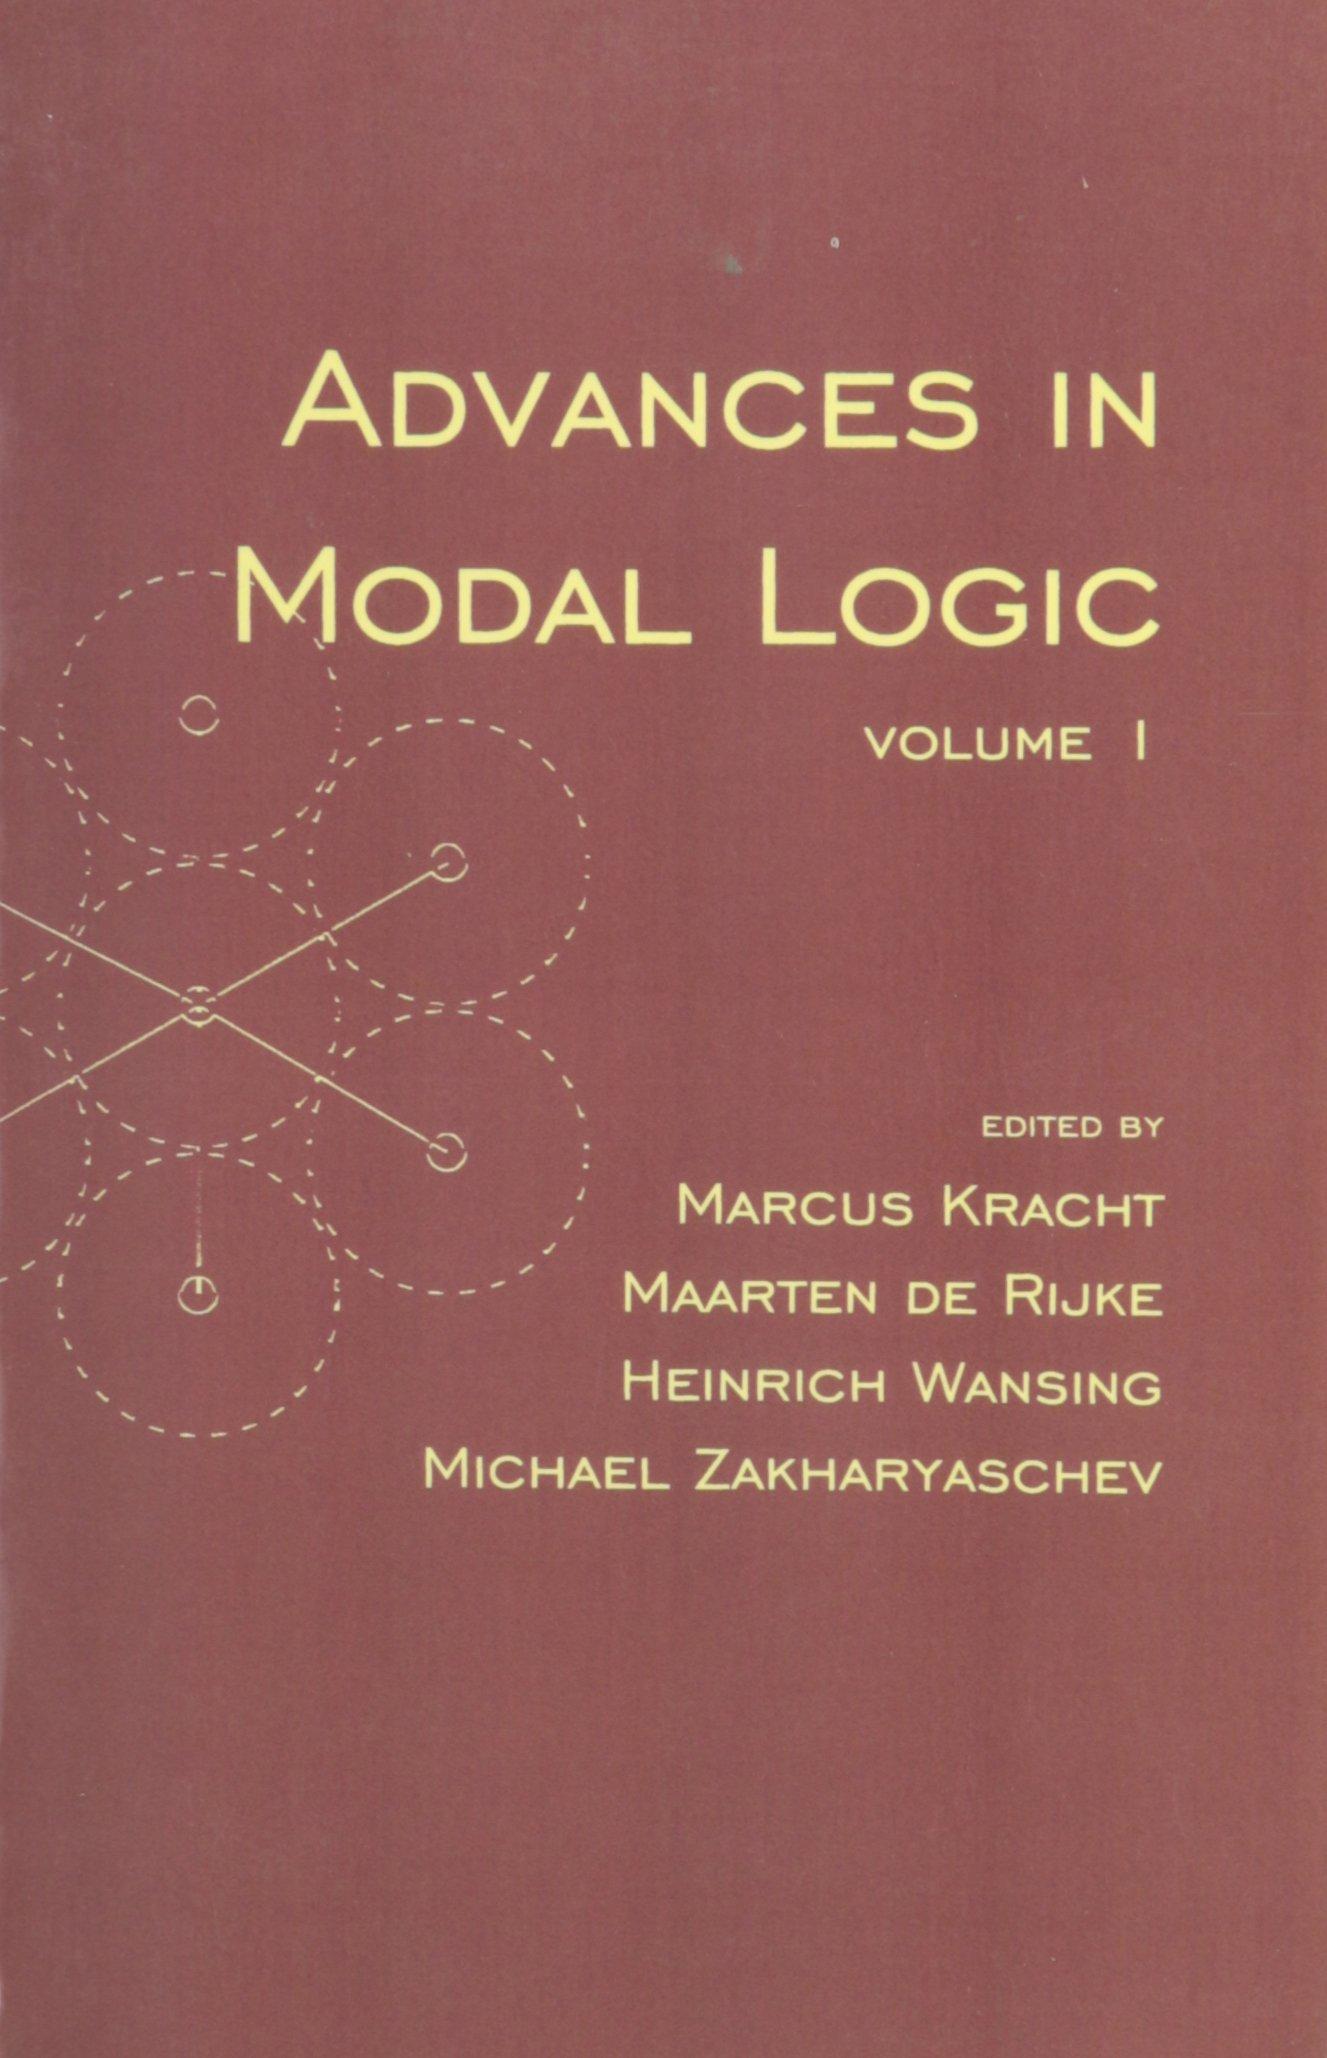 Advances in Modal Logic, Volume 1 (Lecture Notes) PDF